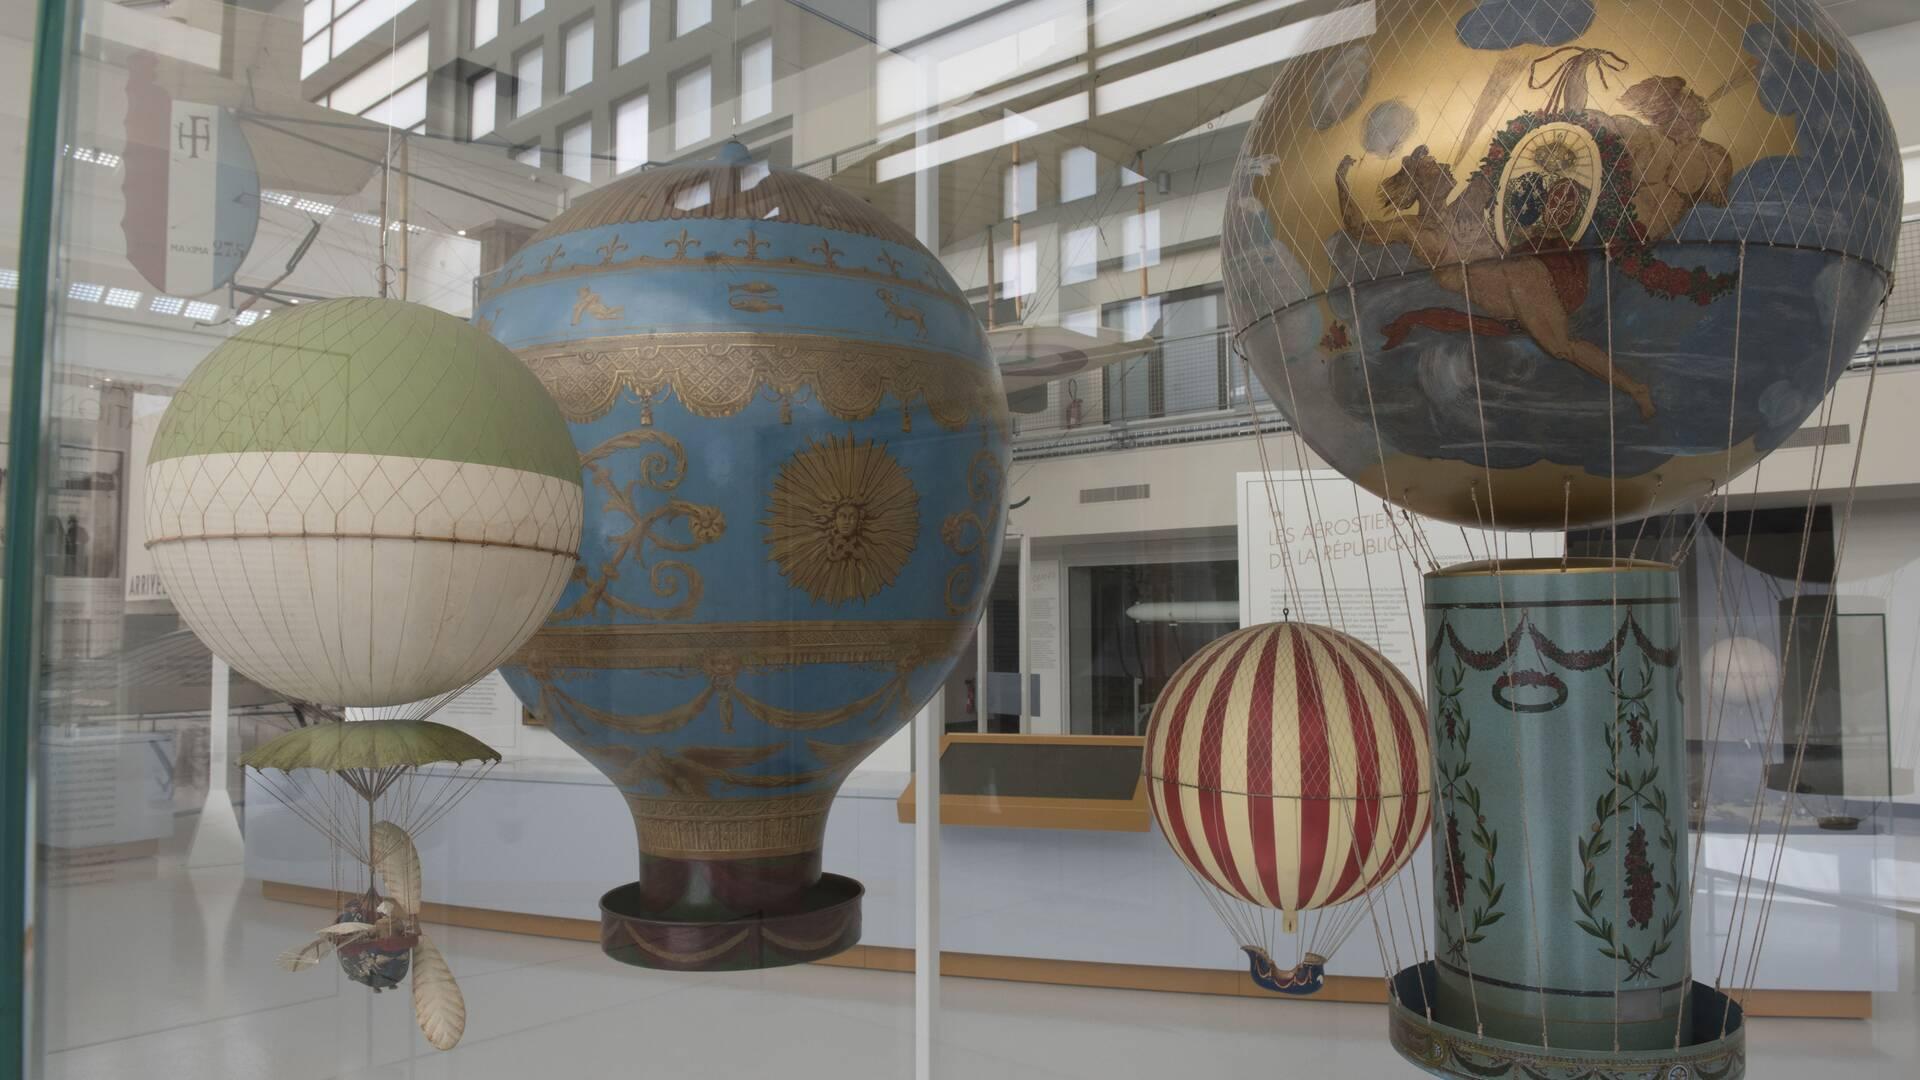 pionniers-de-l-air-grande-galerie-musee-air-espace-bourget